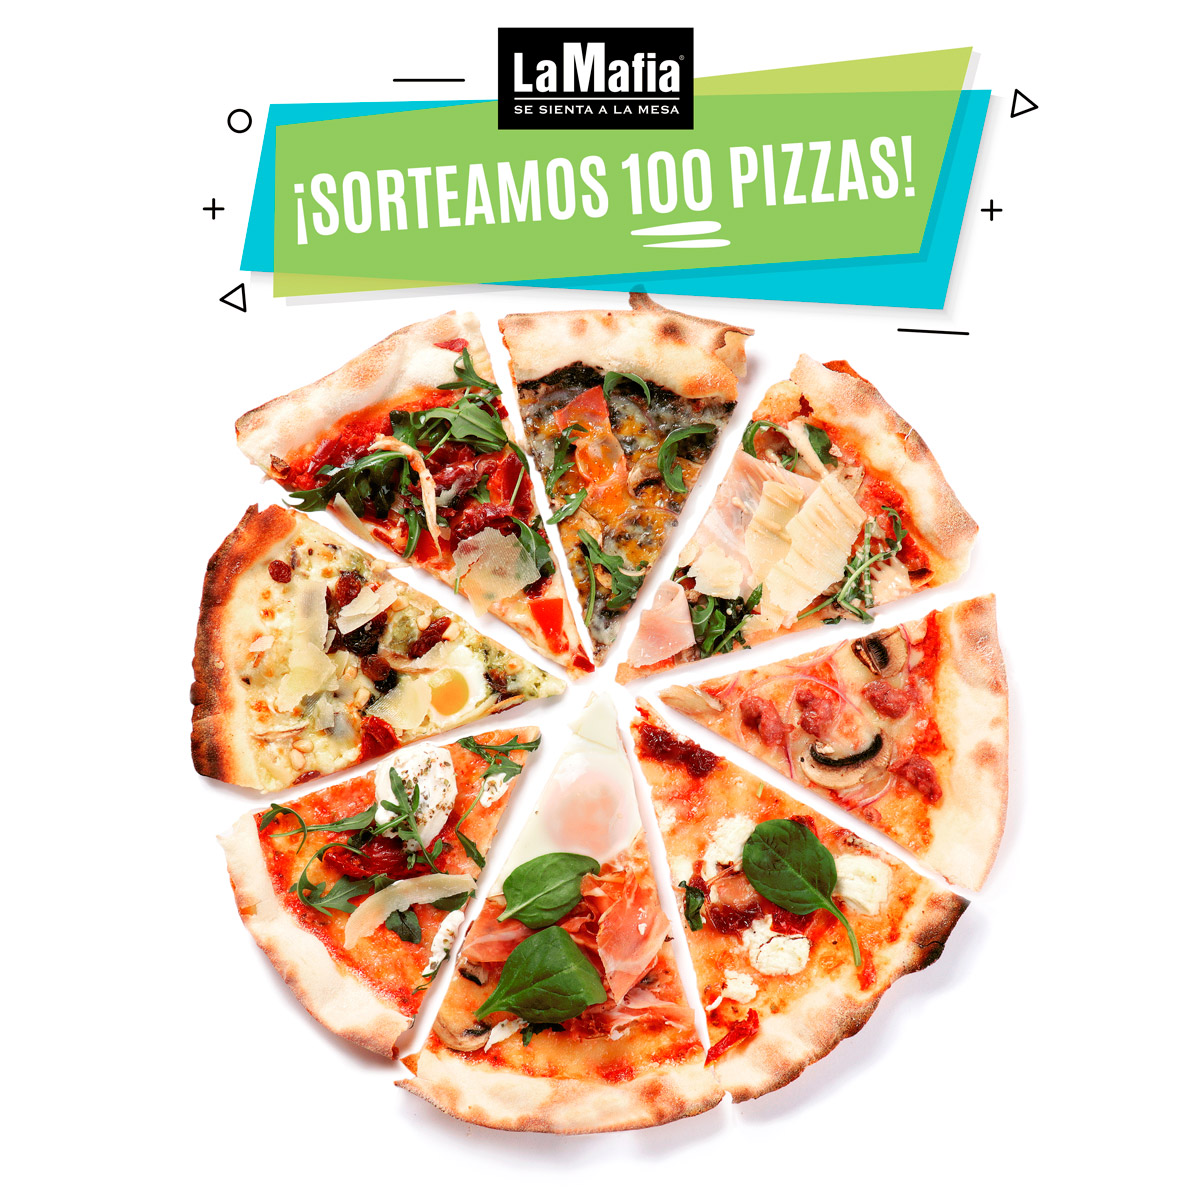 Gif Pizzas trozos Sorteo 100 Pizzas - Sorteo del verano: 100 pizzas de 'La Mafia se sienta a la mesa'